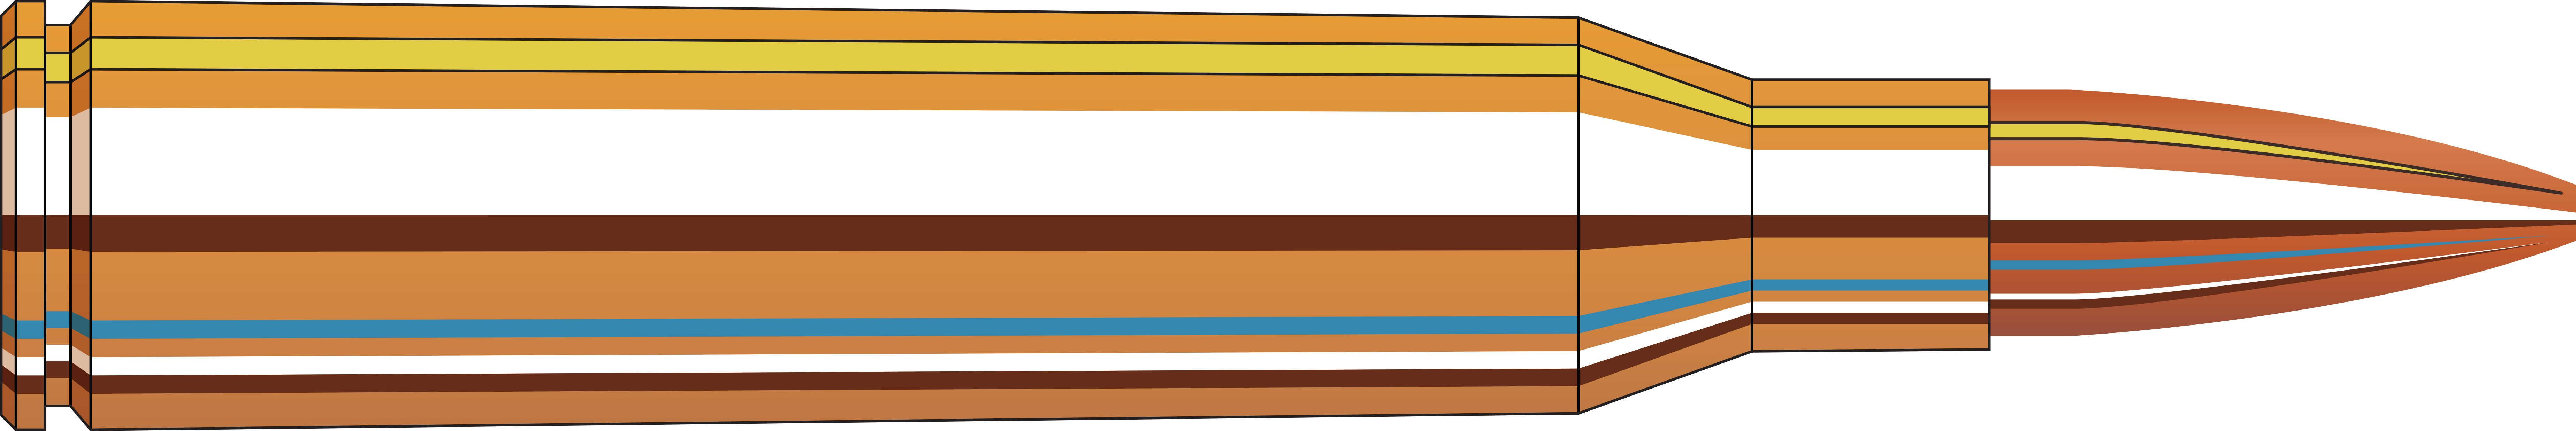 Hornady Match 338 Lapua Magnum 250 Grain Boat Tail Hollow Point 20 Round Box 8230